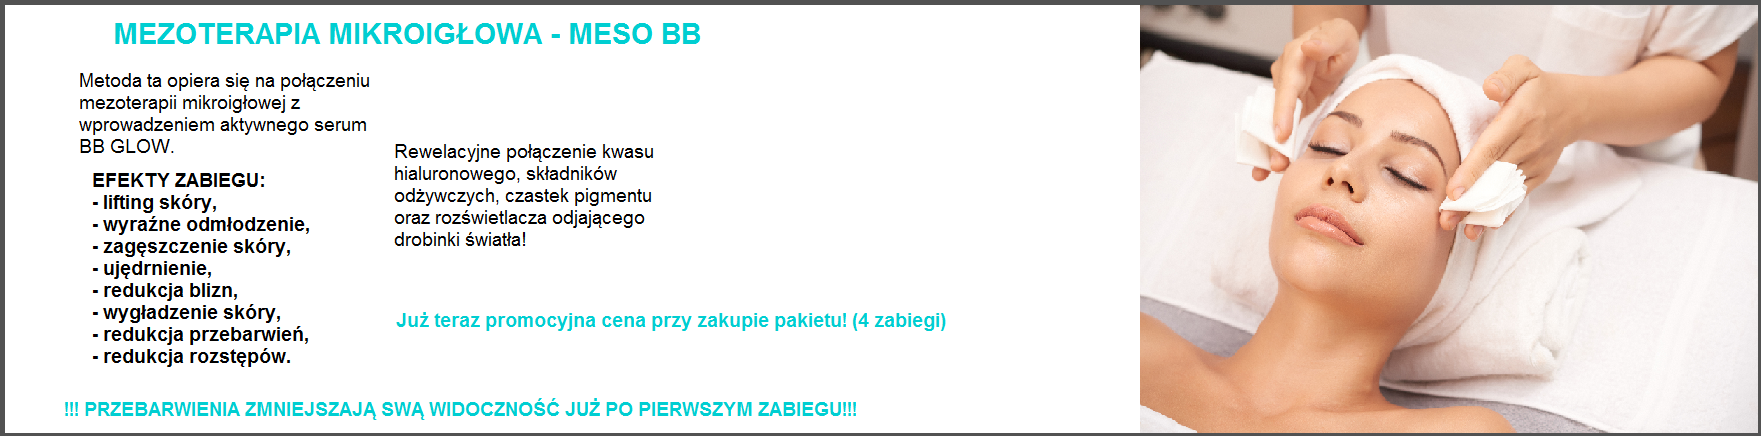 meso bb